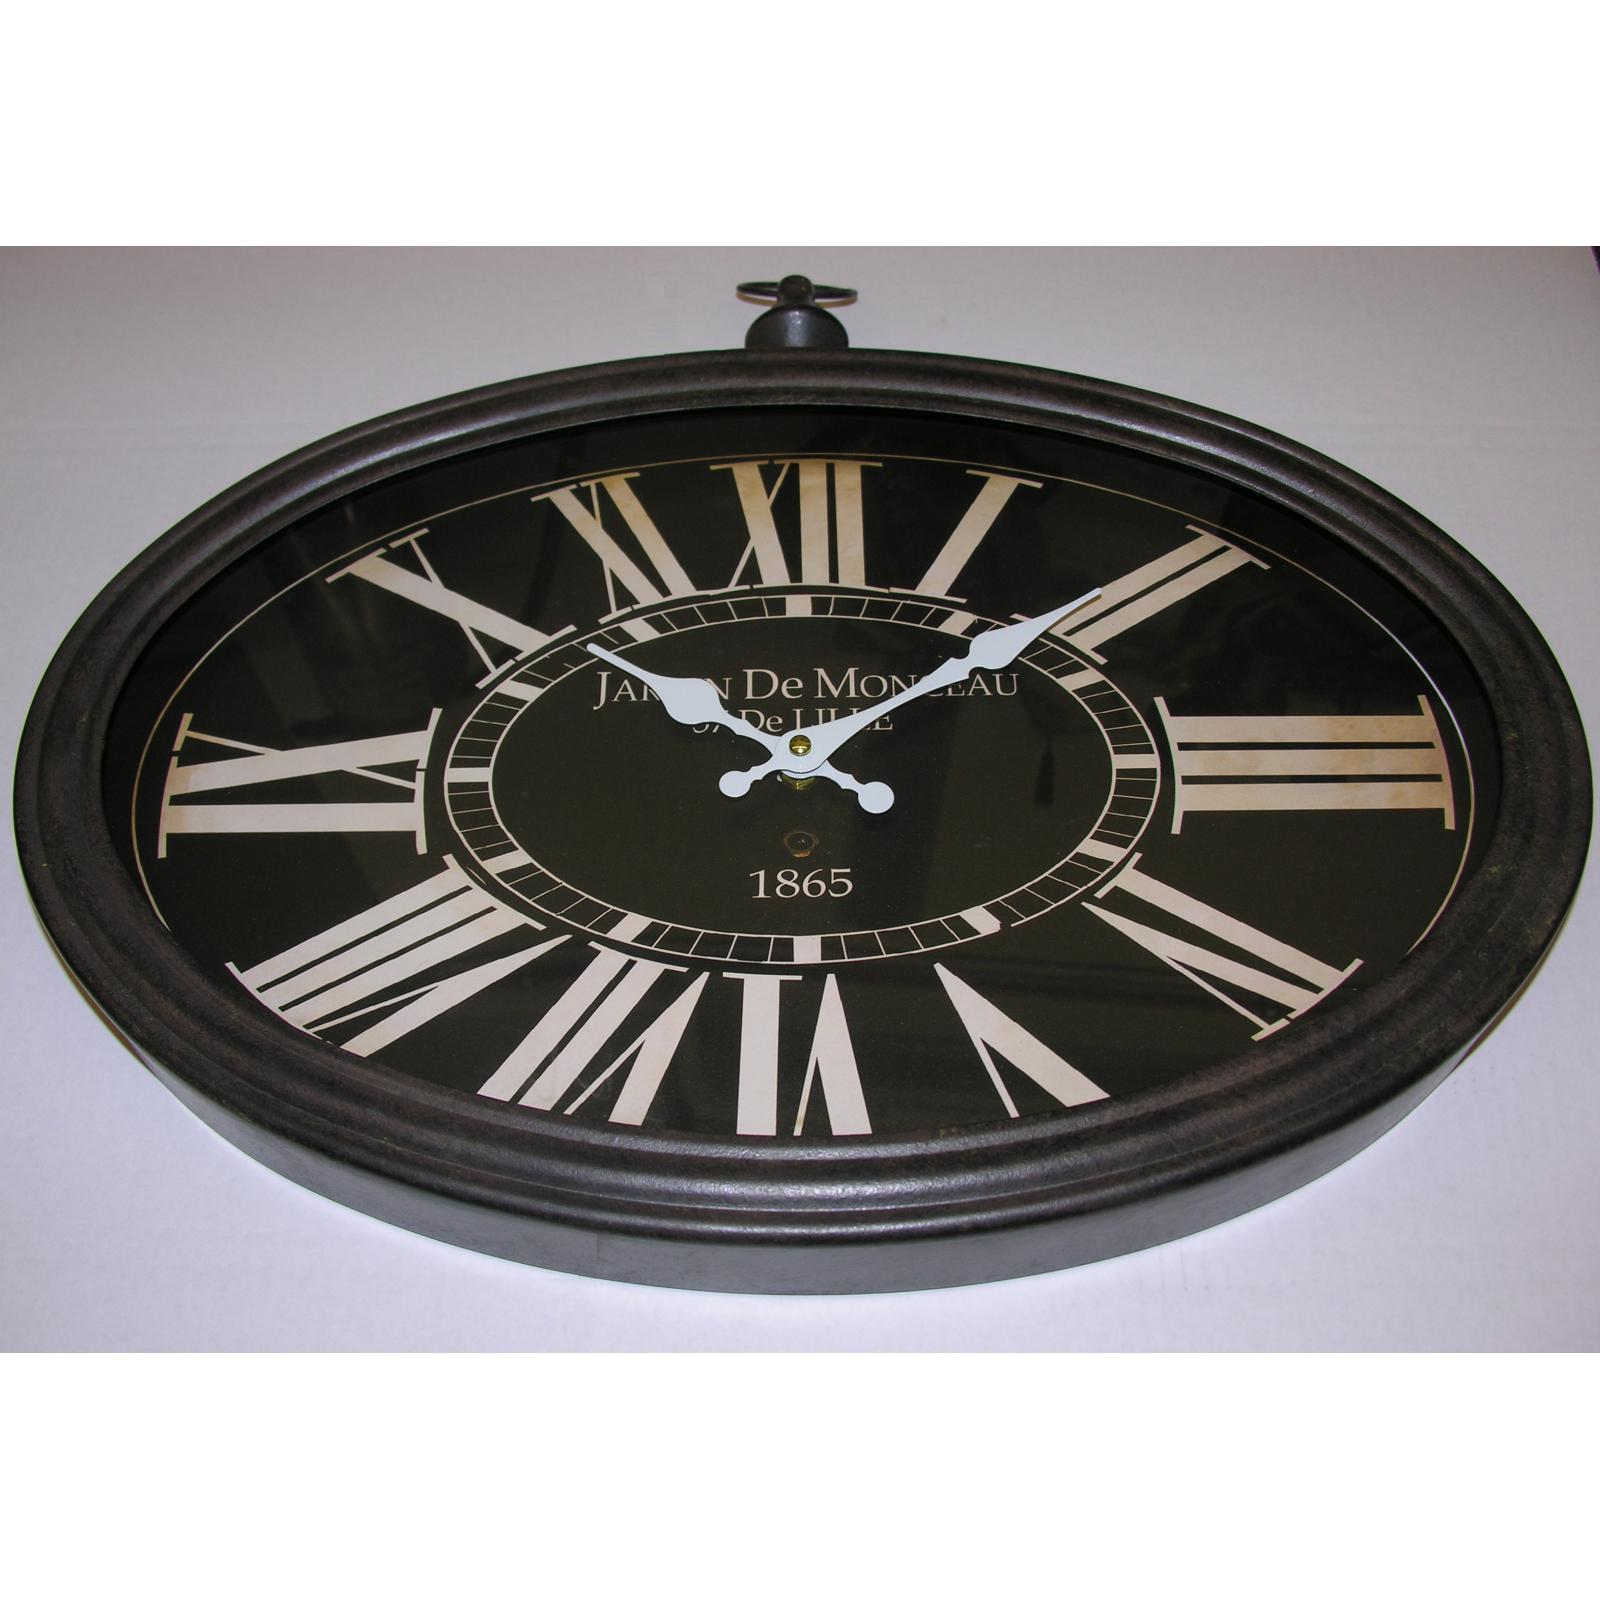 style nostalgie r tro xxl horloge murale m tal verre ovale 50cm shabby chic ebay. Black Bedroom Furniture Sets. Home Design Ideas